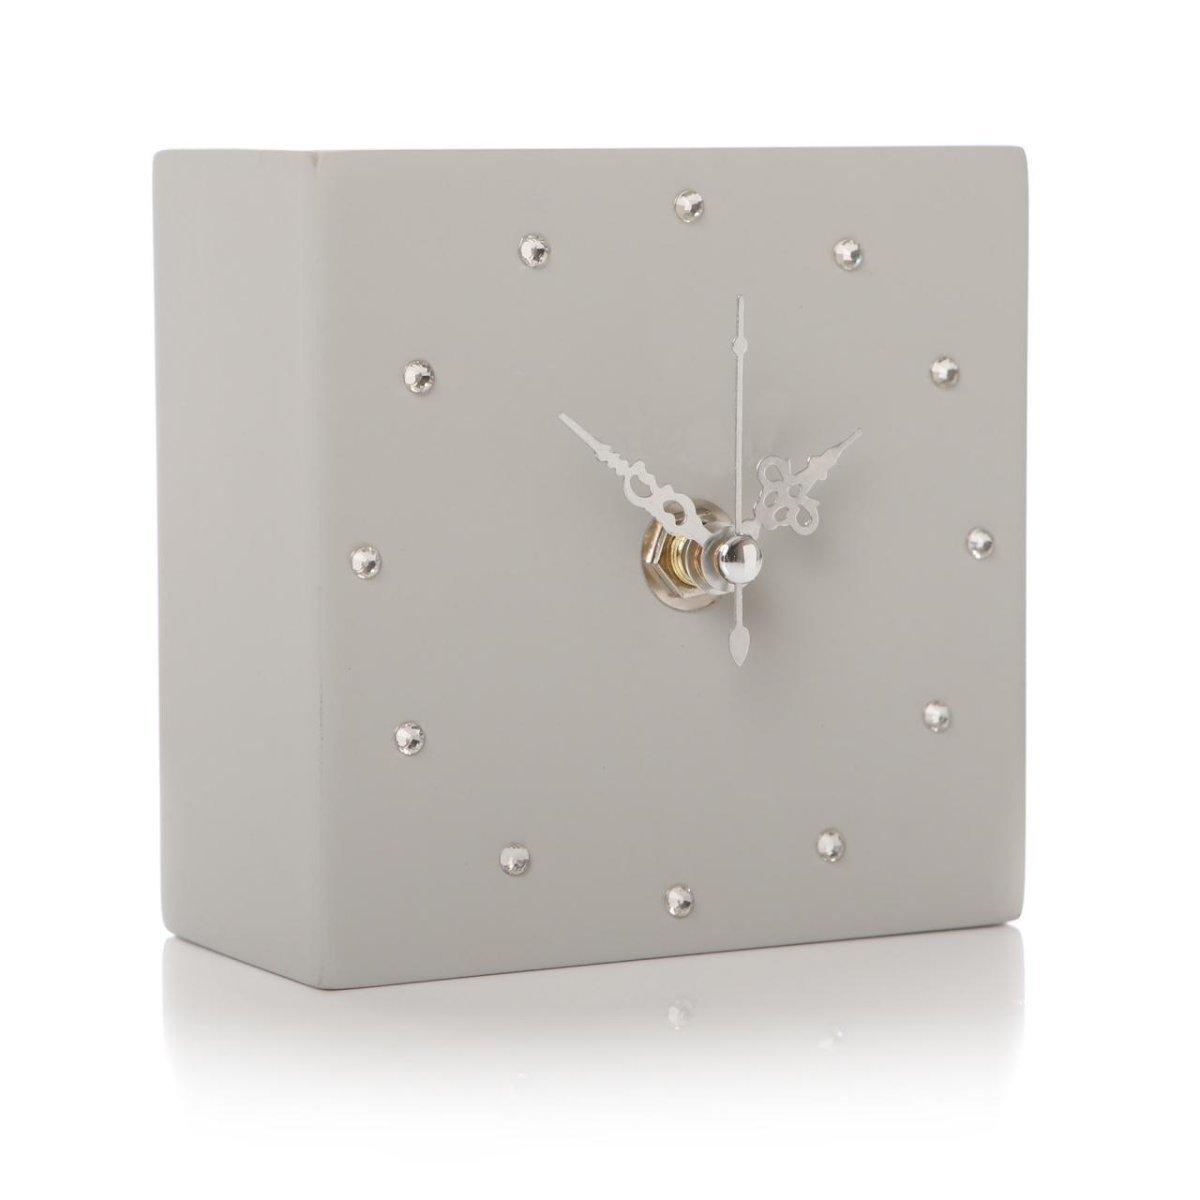 Glamorous Shruti Gem Crystal Cube Shelf Mantel Clock - Various Colours (Light Grey) Junction 18